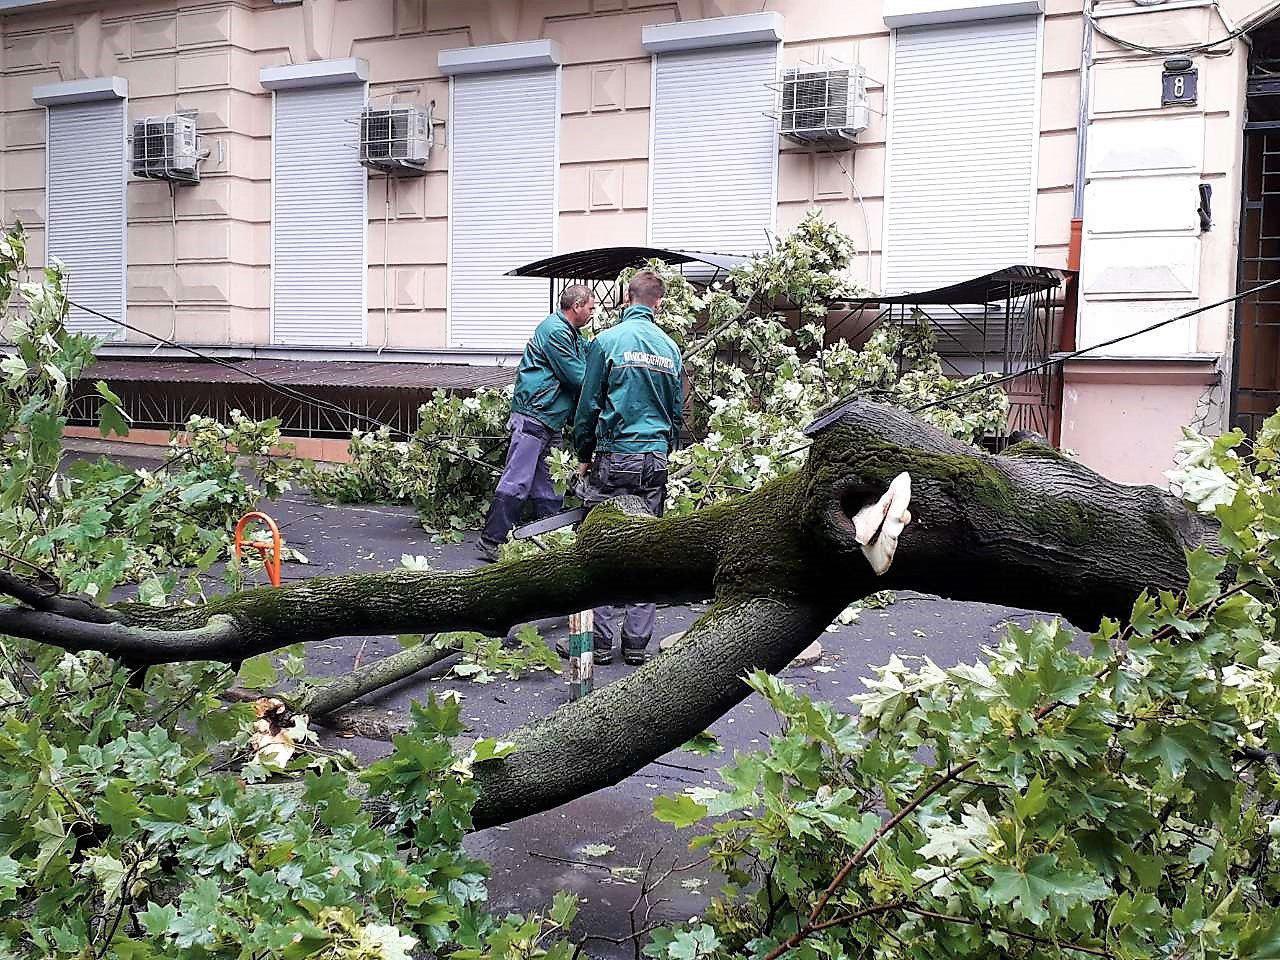 Garten Statue Schön Буря зваРиРа біРьш 22 дерев та зірваРа дроти фото